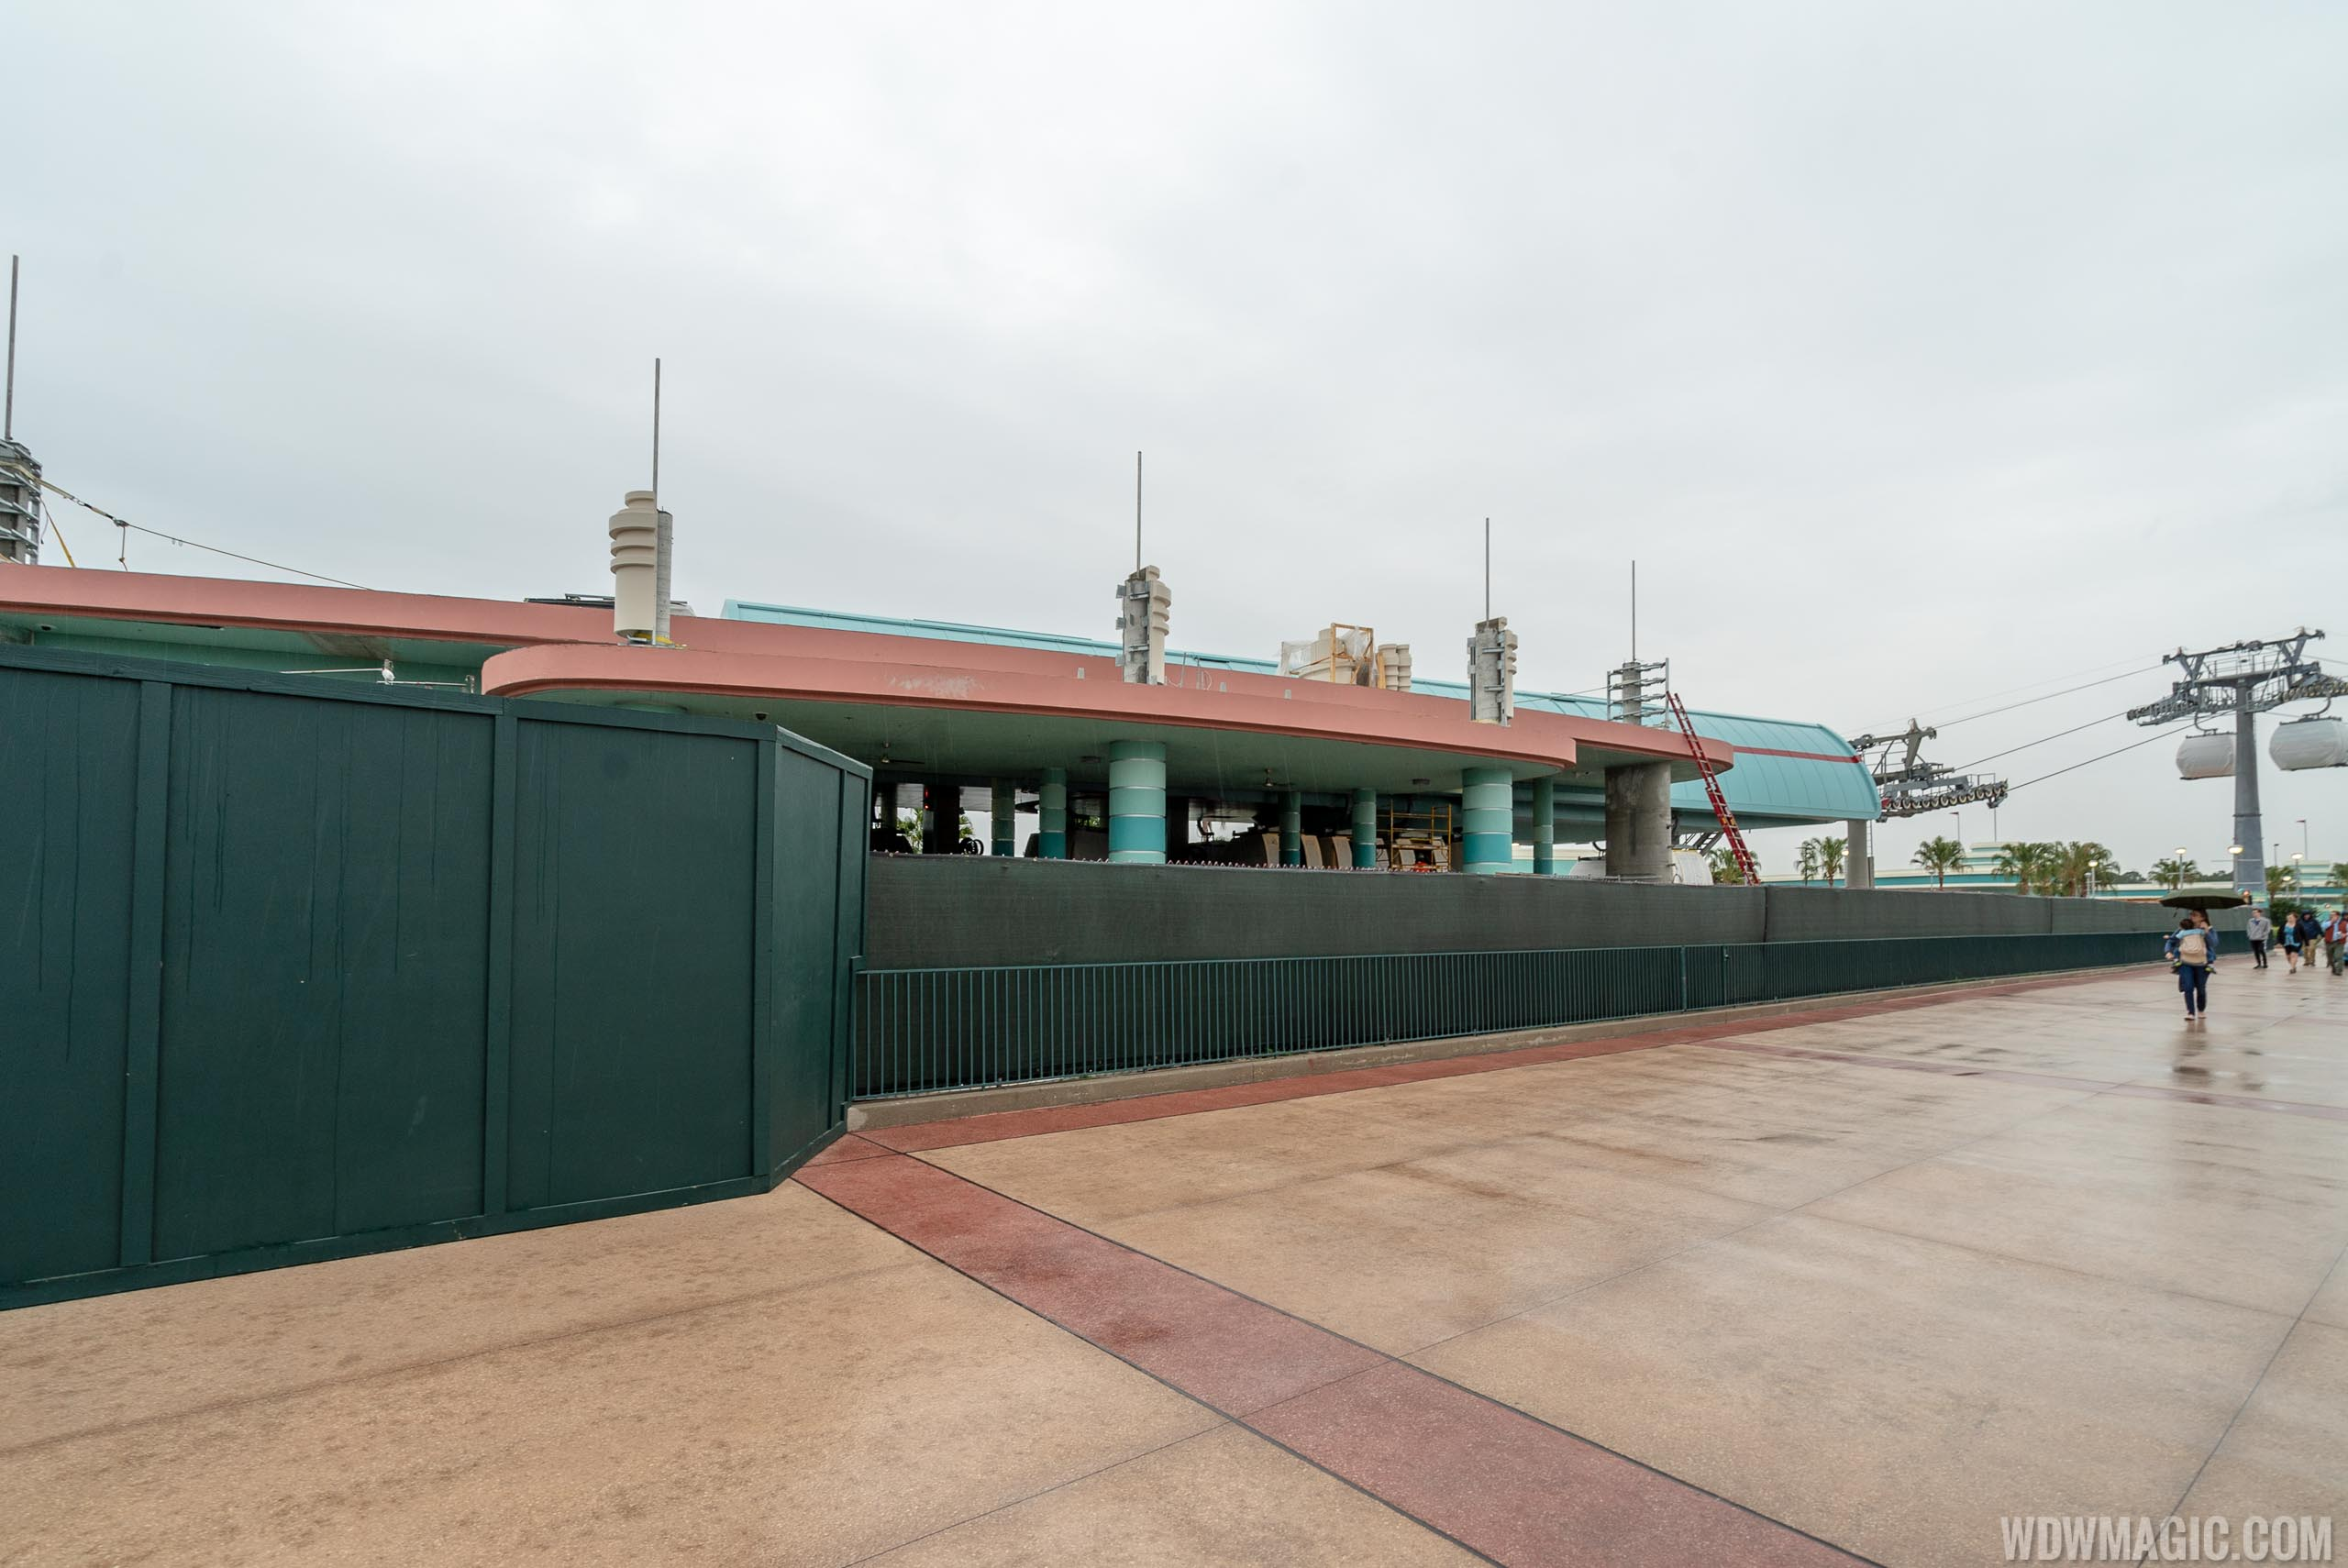 Disney Skyliner testing at Disney's Hollywood Studios